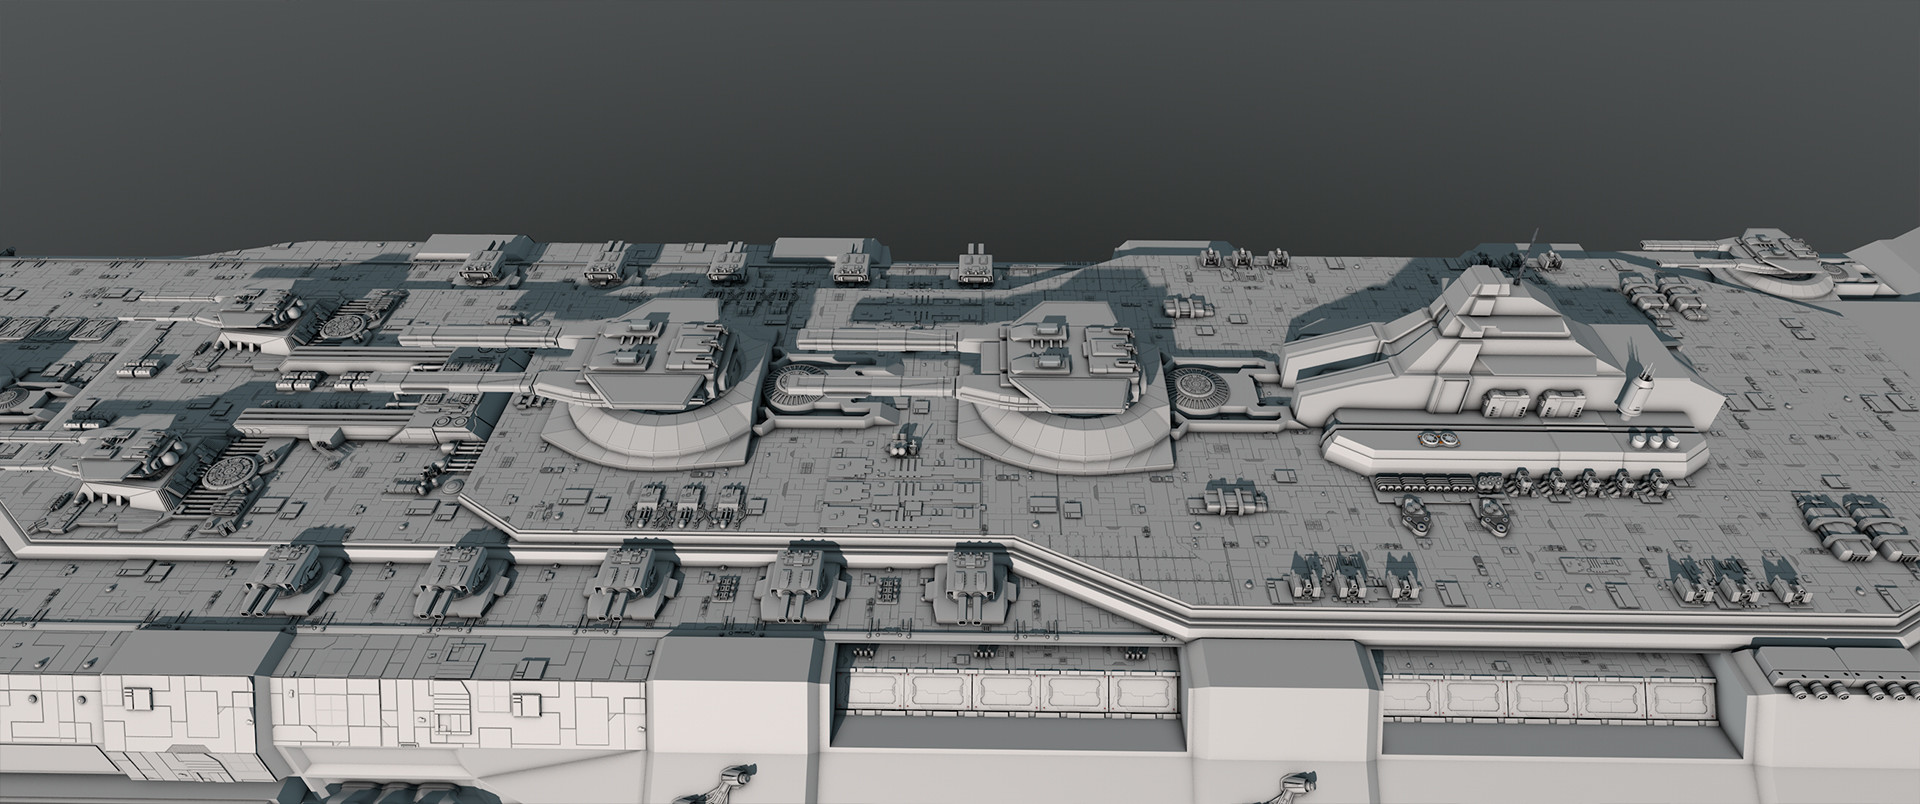 Glenn clovis concept battleship saratoga 14d